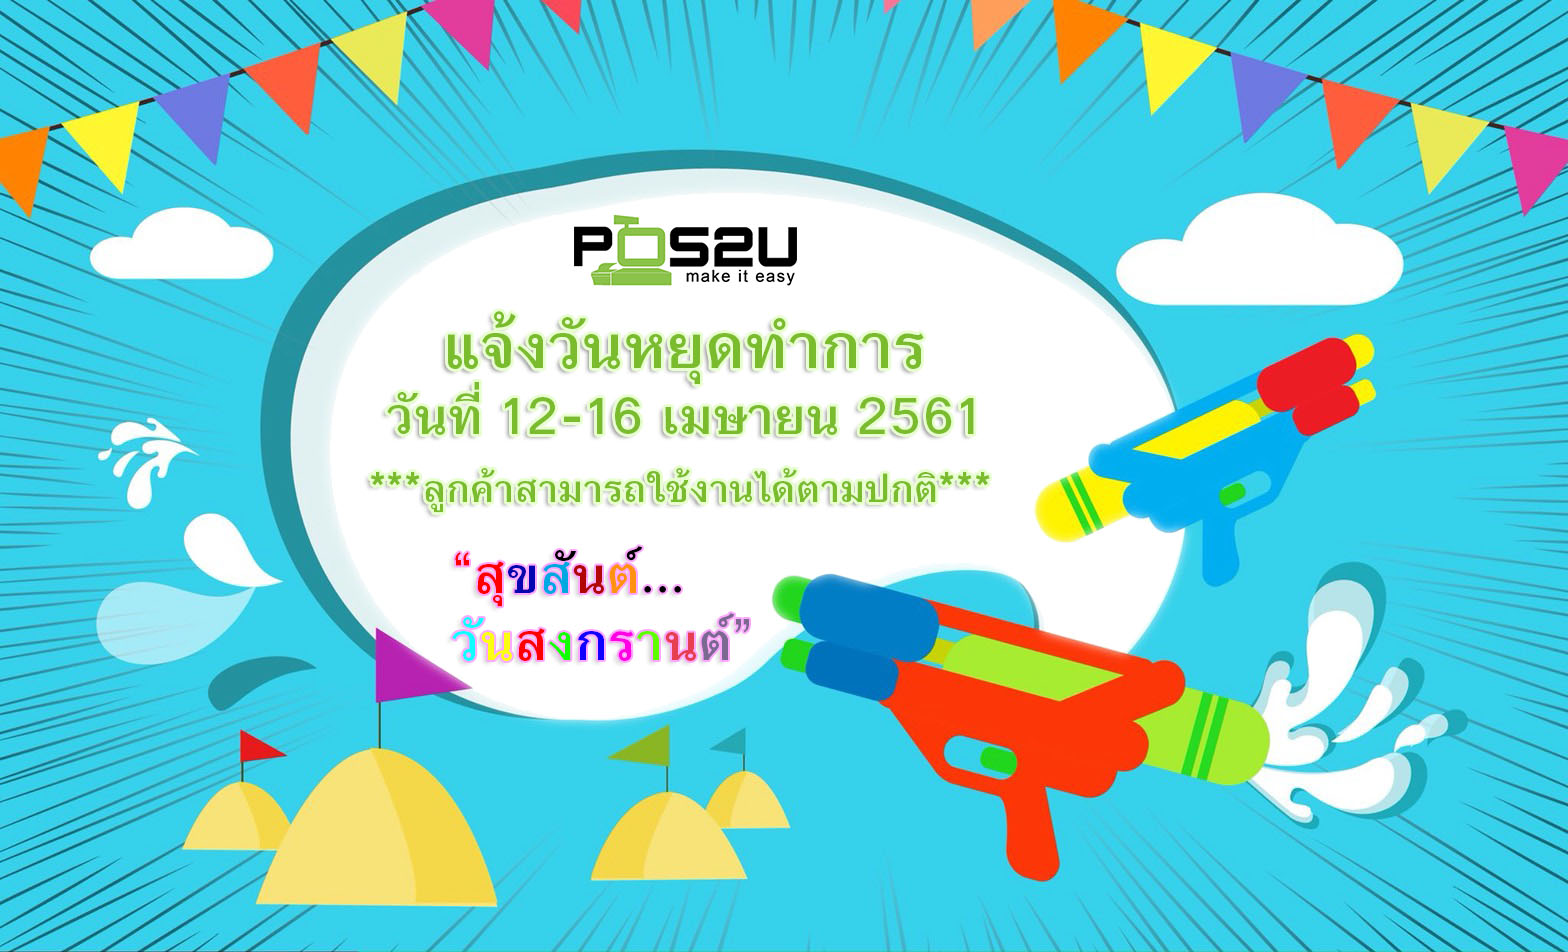 Pos2u 2561